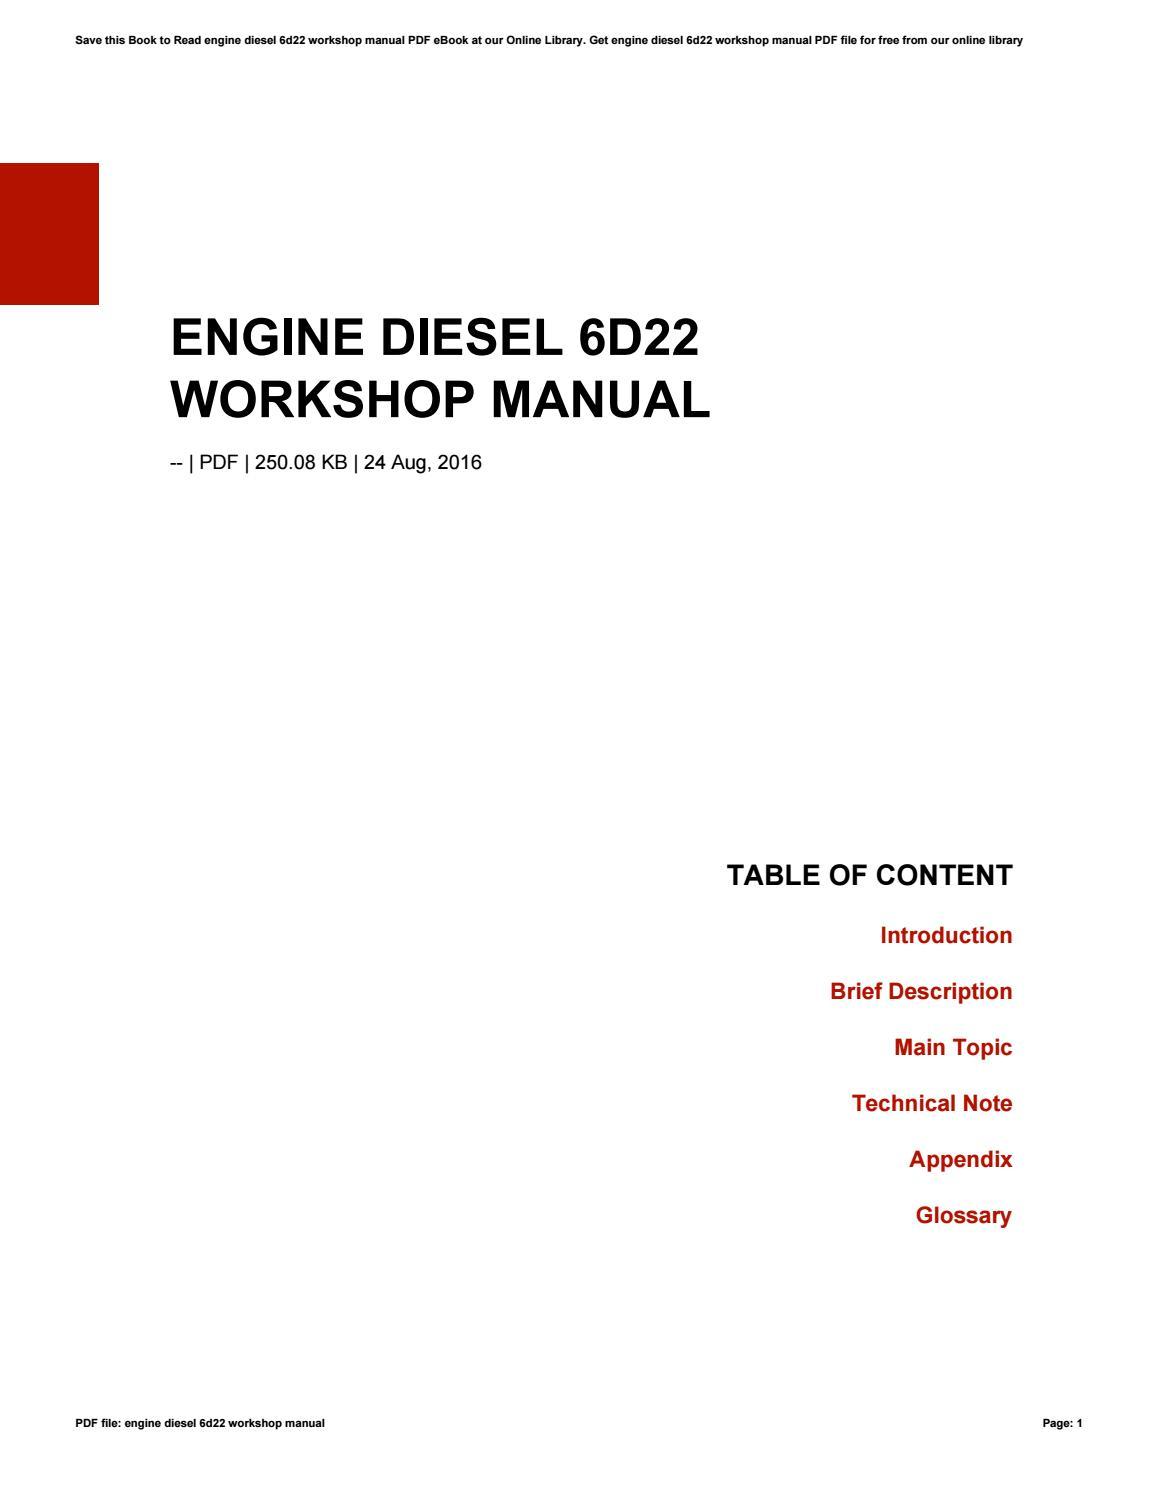 engine diesel 6d22 workshop manual by minex coin814 issuu rh issuu com Dodge Ram 2500 Diesel Manual Manual Transmission Diesel